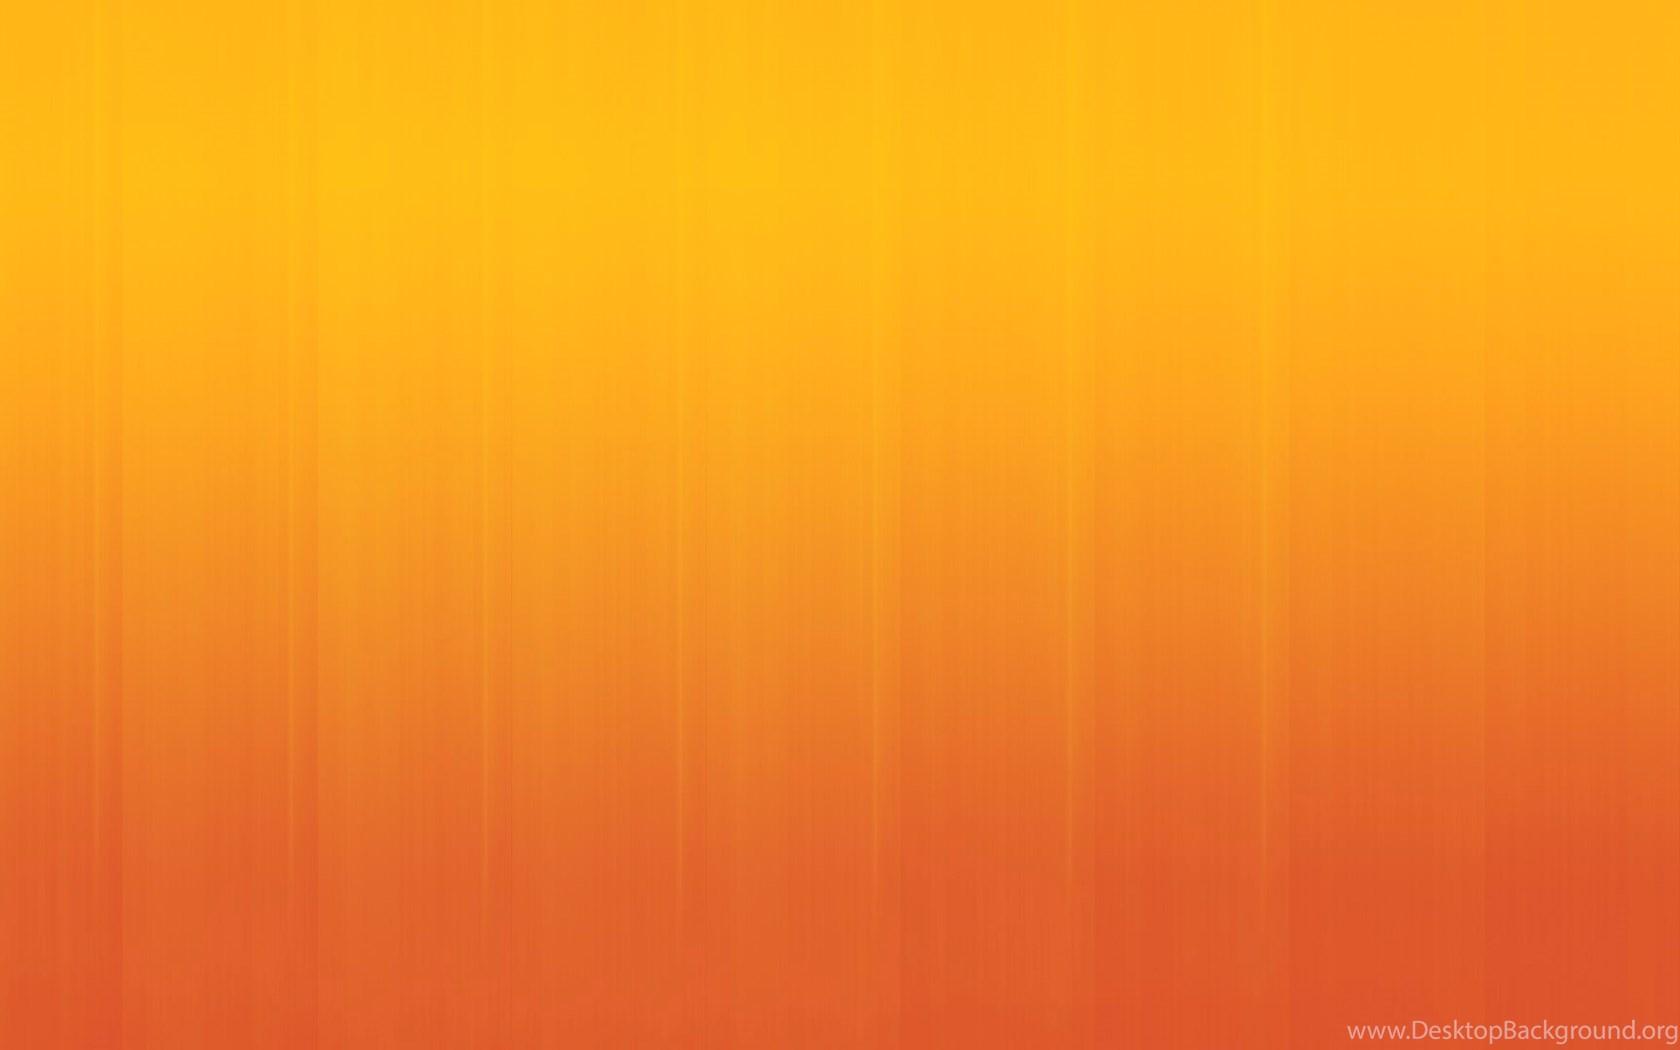 minimal digital backgrounds hd wallpapers desktop background